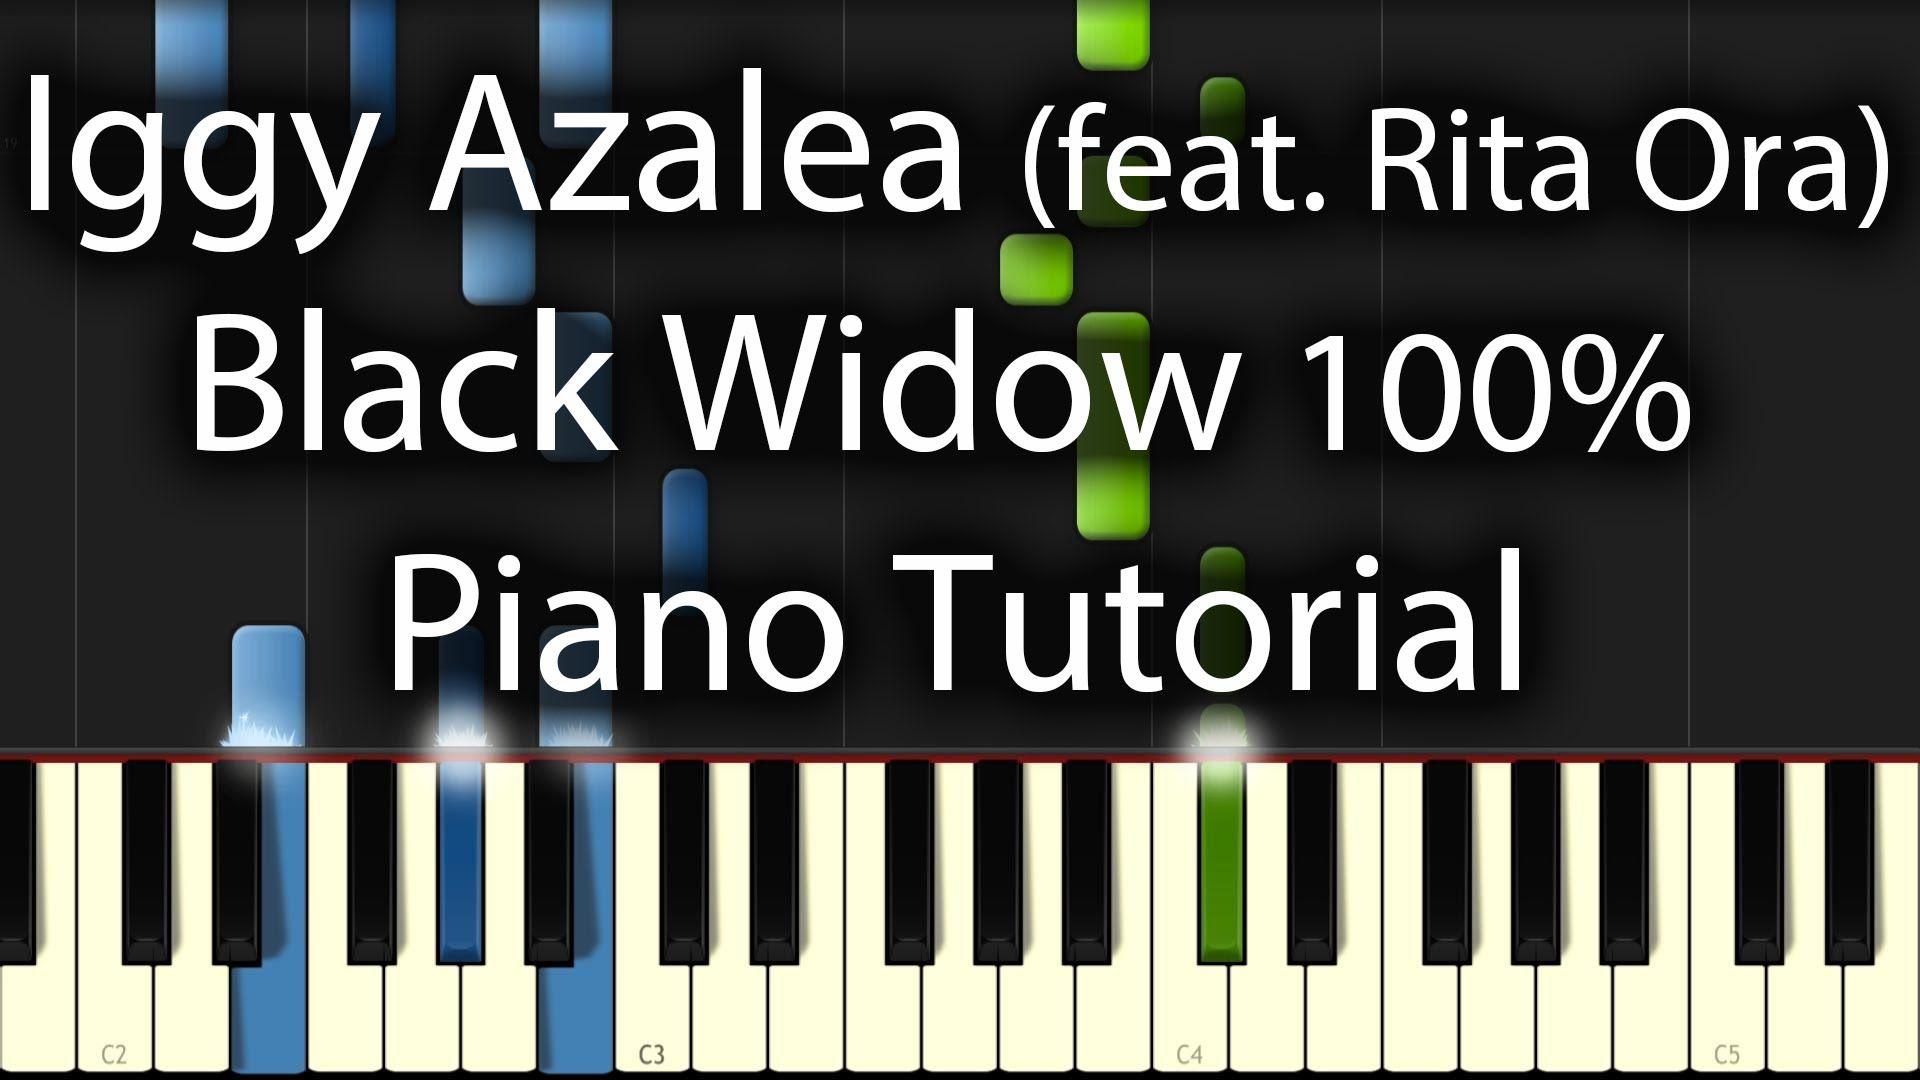 Iggy Azalea Feat Rita Ora Black Widow Tutorial How To Play On